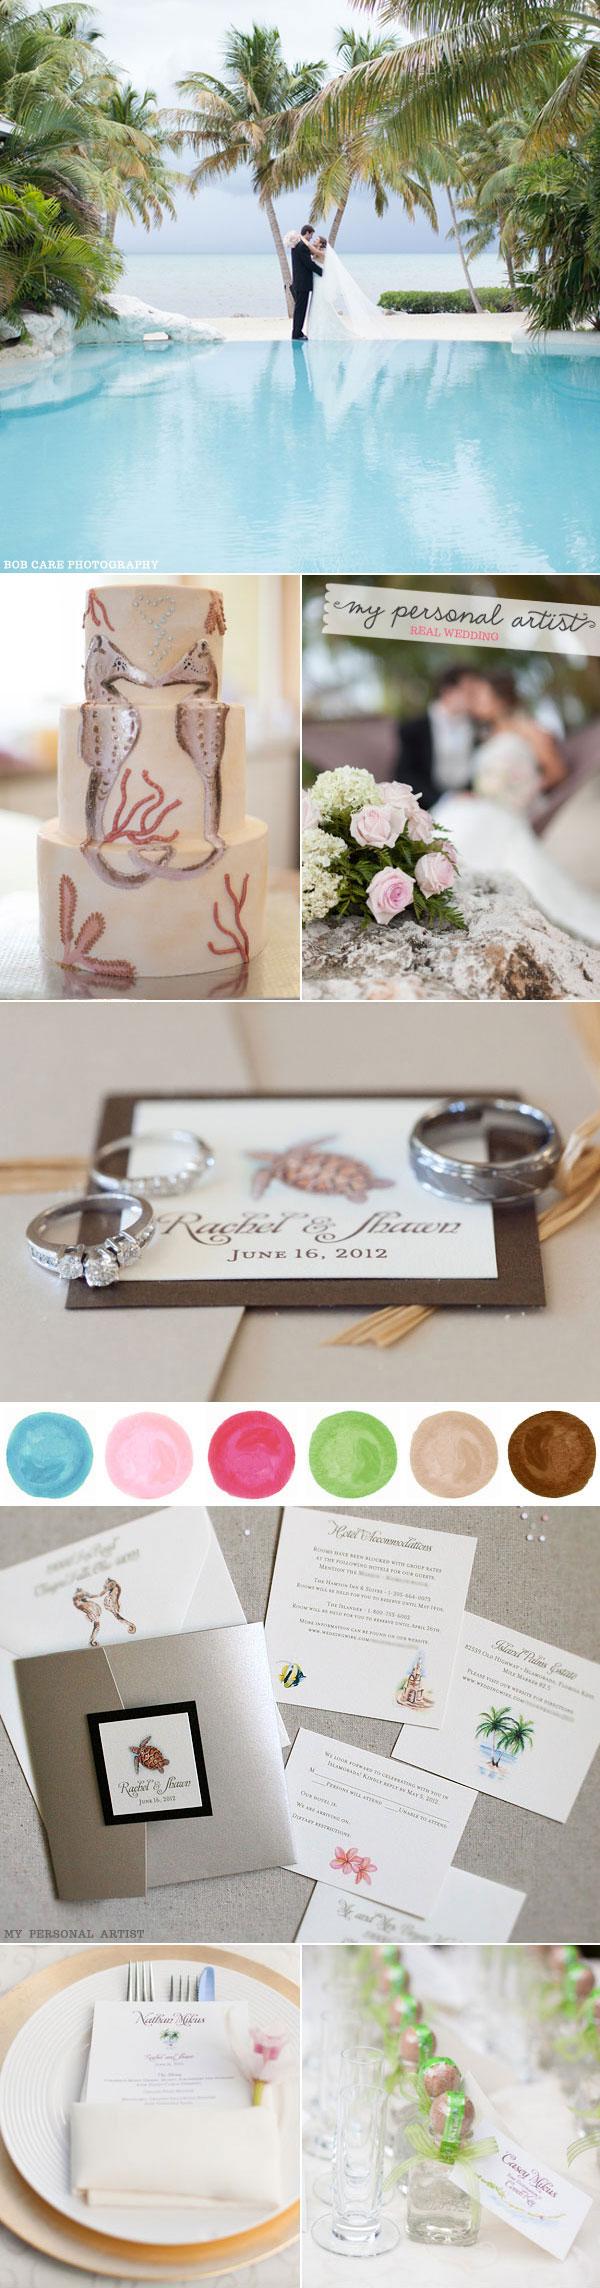 Elegant Beach Wedding Invitations Beach Wedding Ideas Mospens Studio Custom Wedding Invitations Stationery